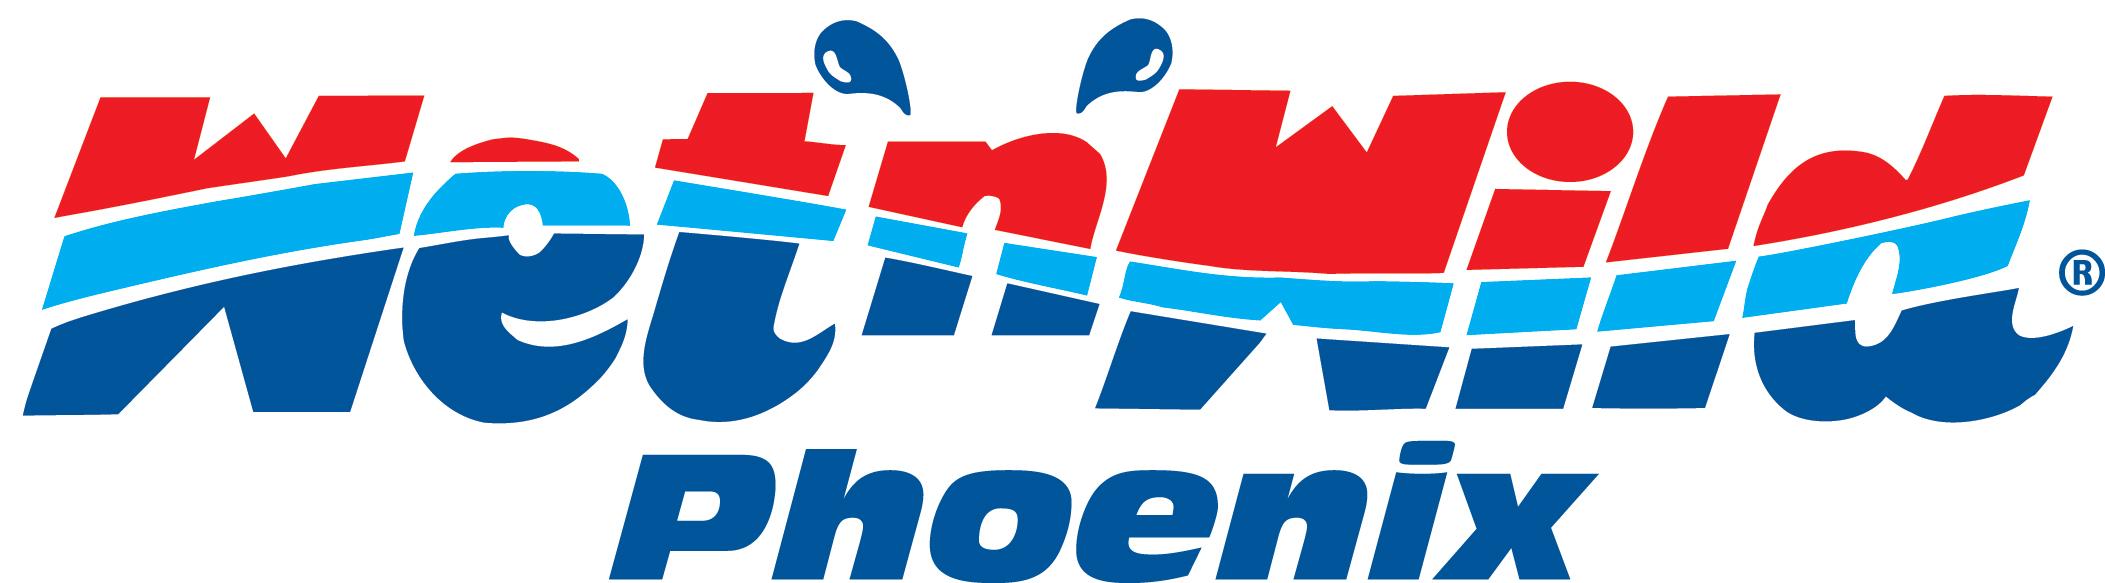 Wet n wild waterpark phoenix coupons